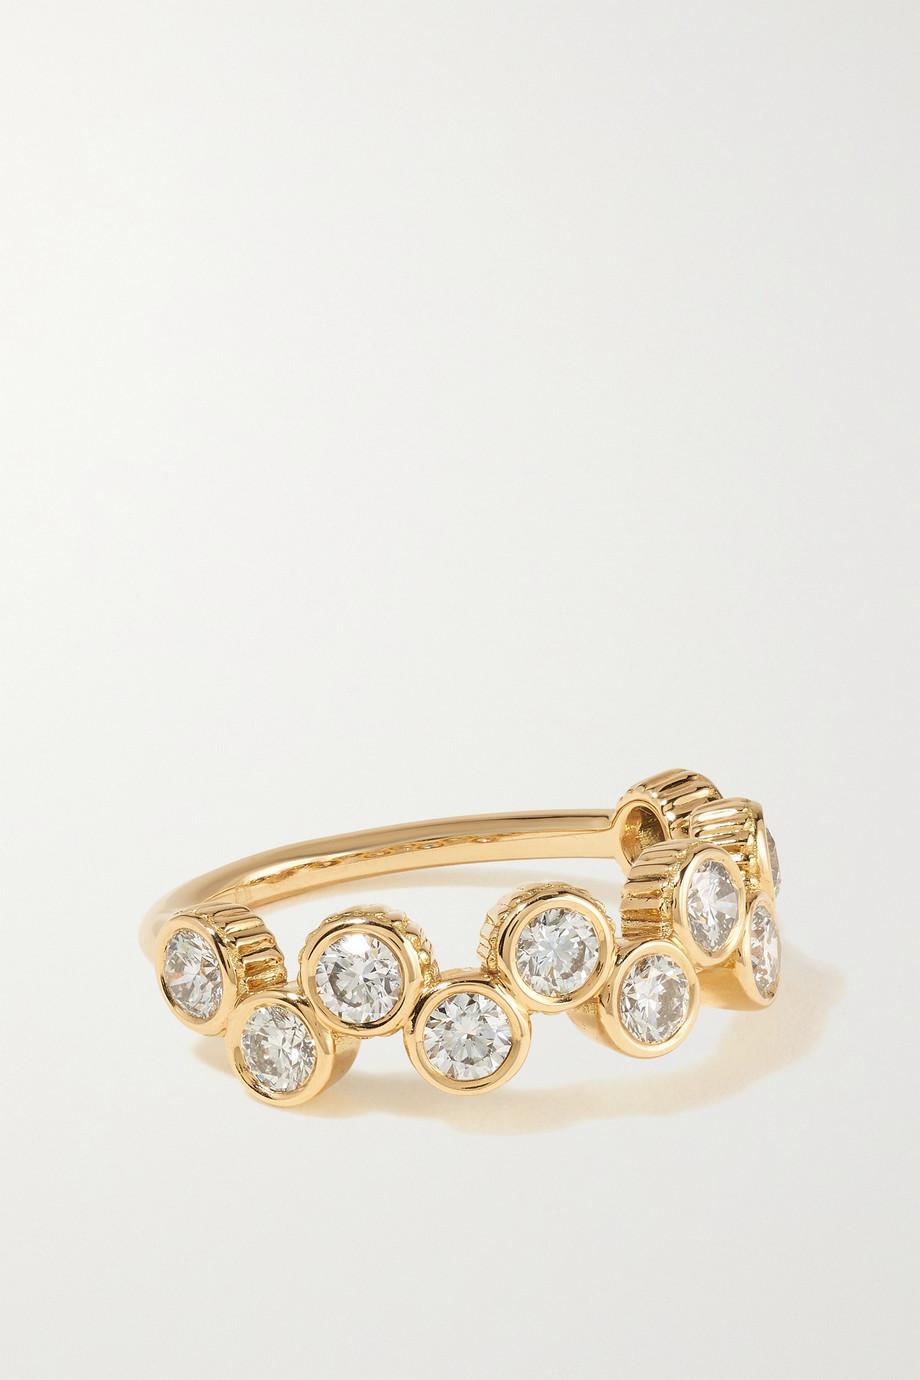 Viltier Clique Ring aus 18 Karat Gold mit Diamanten